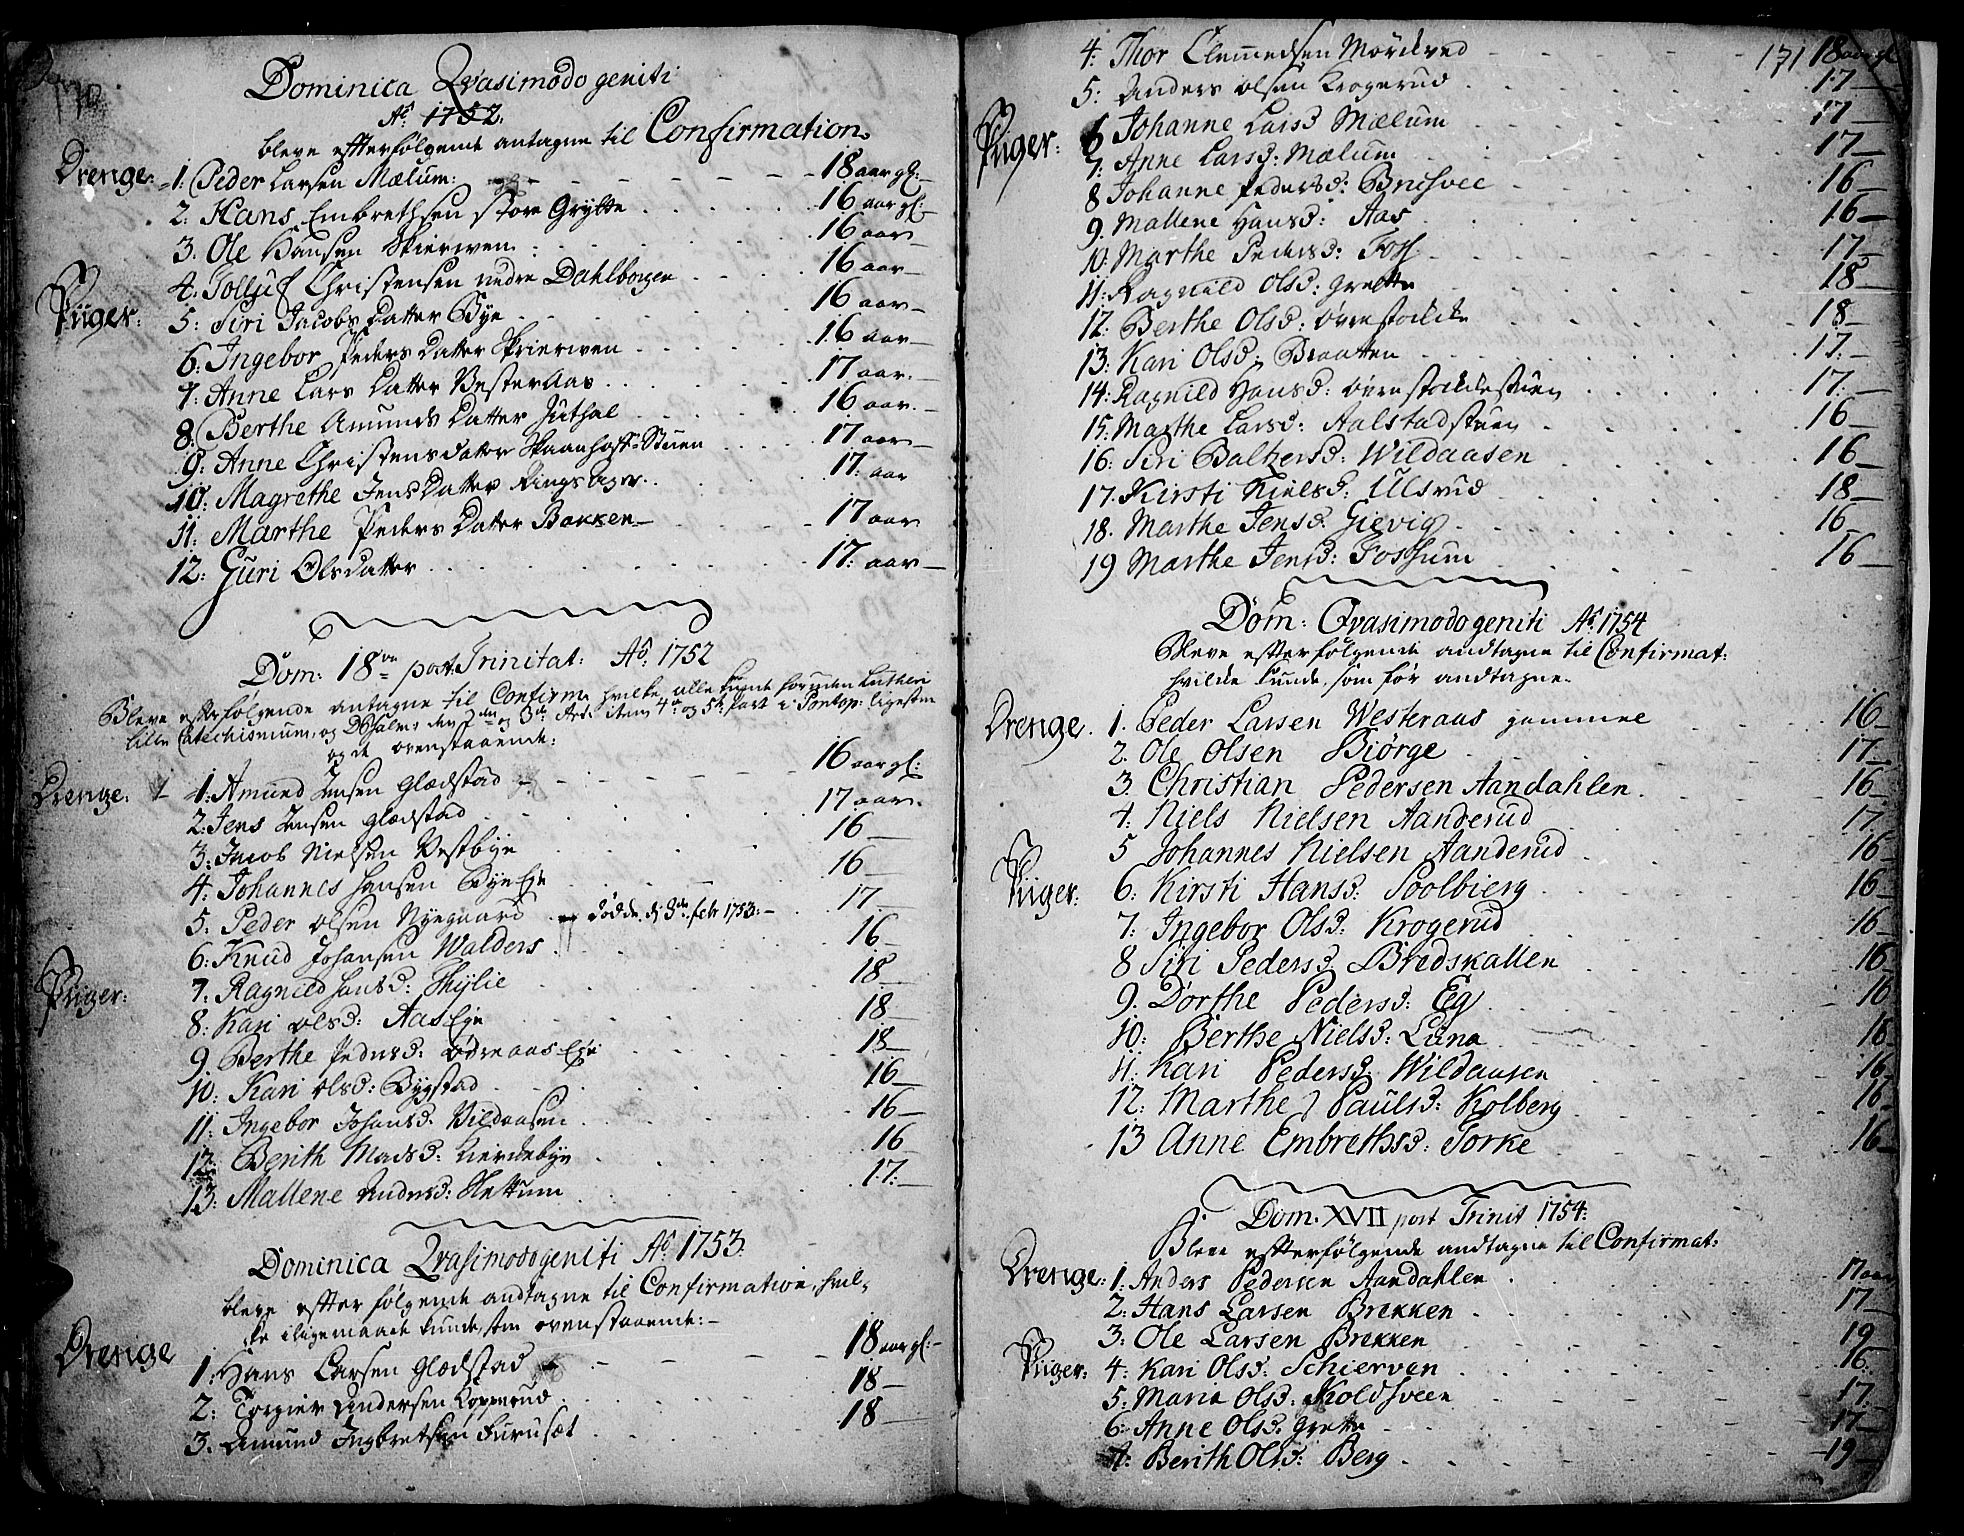 SAH, Vardal prestekontor, H/Ha/Haa/L0002: Ministerialbok nr. 2, 1748-1776, s. 170-171